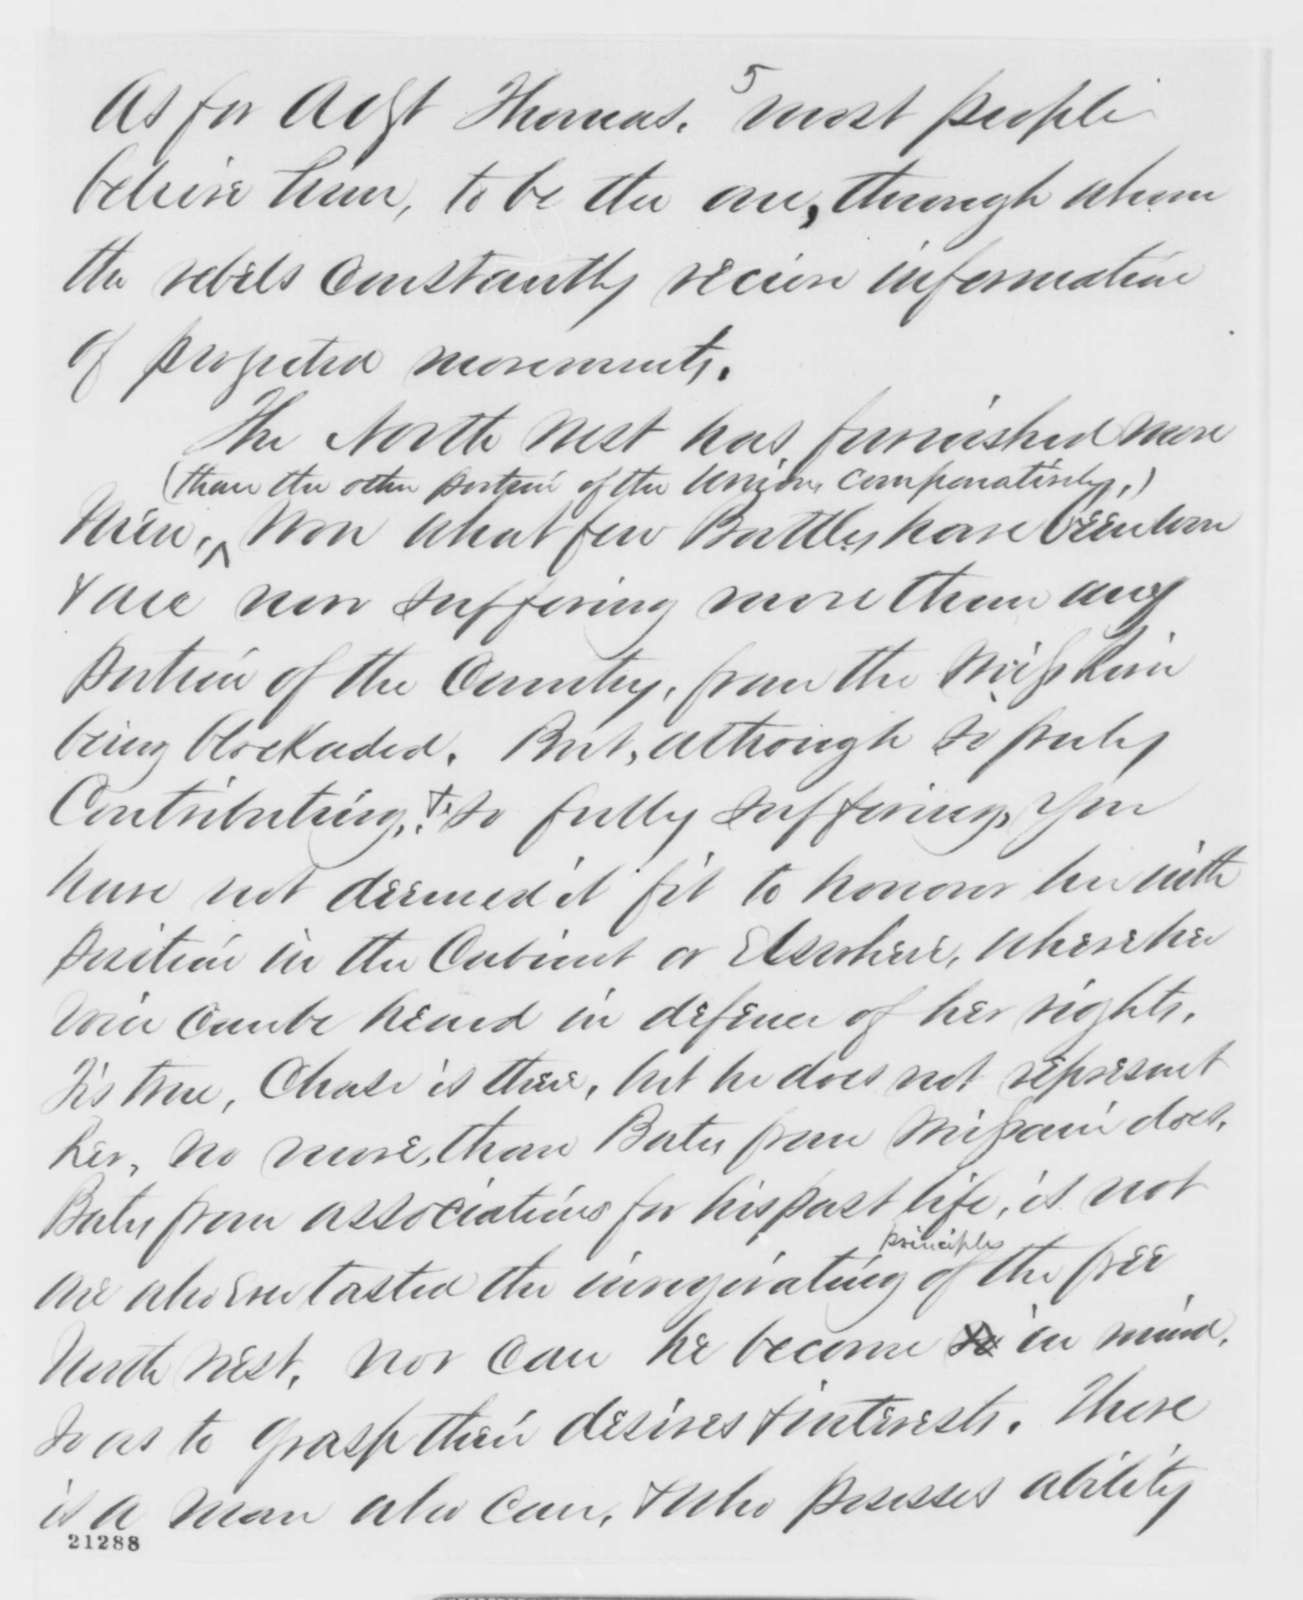 J. J. Richards to Abraham Lincoln, Wednesday, January 21, 1863  (Cabinet advice)